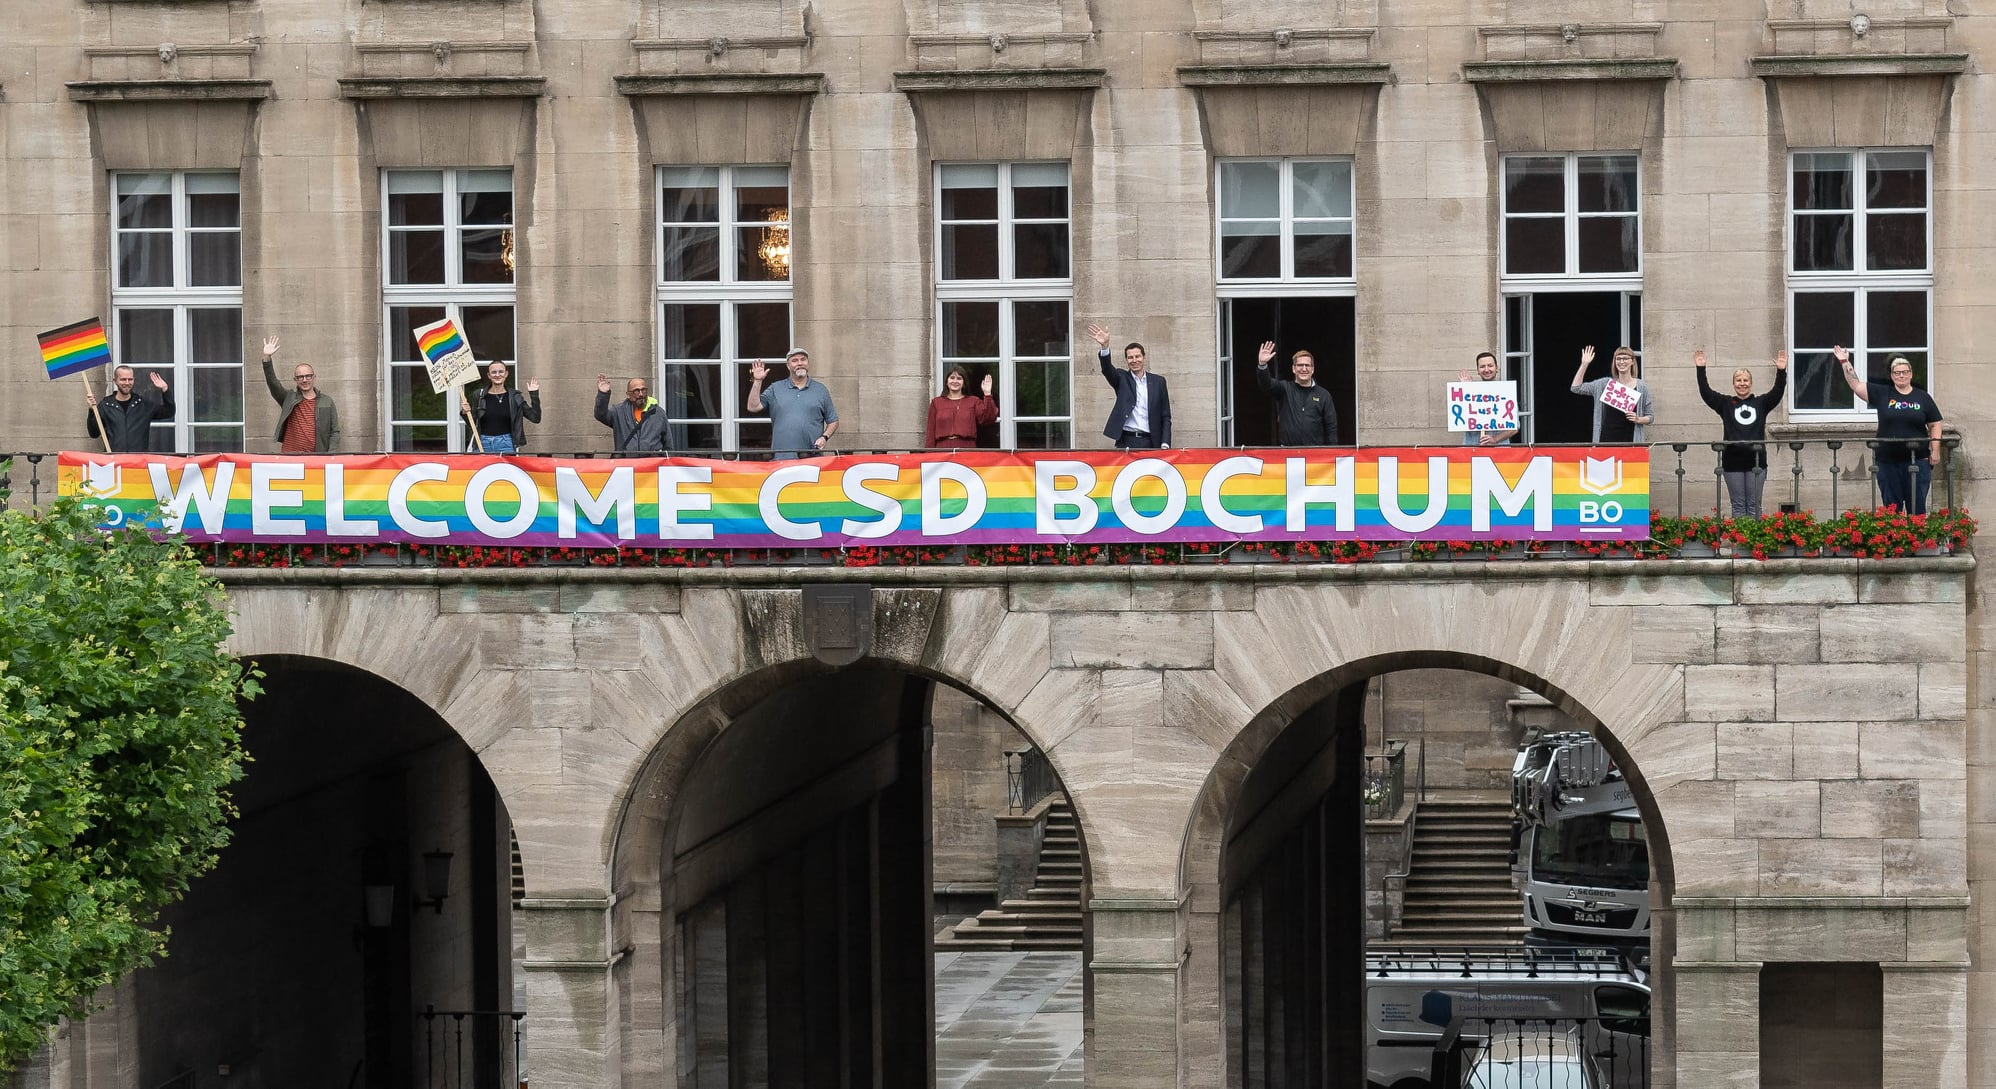 Csd Bochum